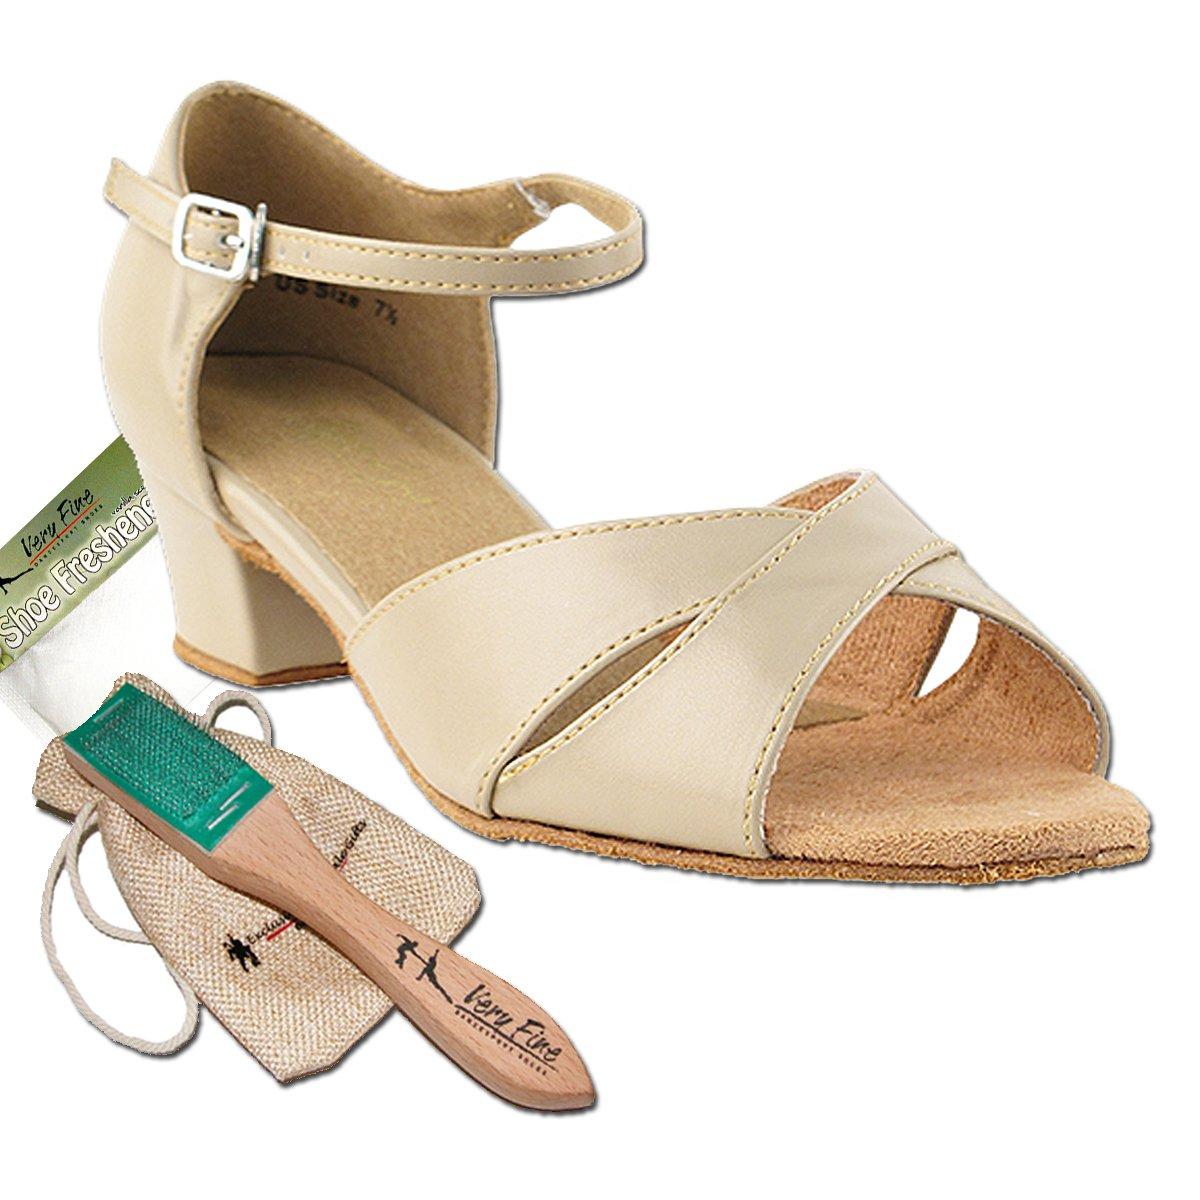 Women's Ballroom Dance Shoes Salsa Latin Practice Dance Shoes Tan Leather 803EB Comfortable - Very Fine 1.5'' Heel 7 M US [Bundle of 5]